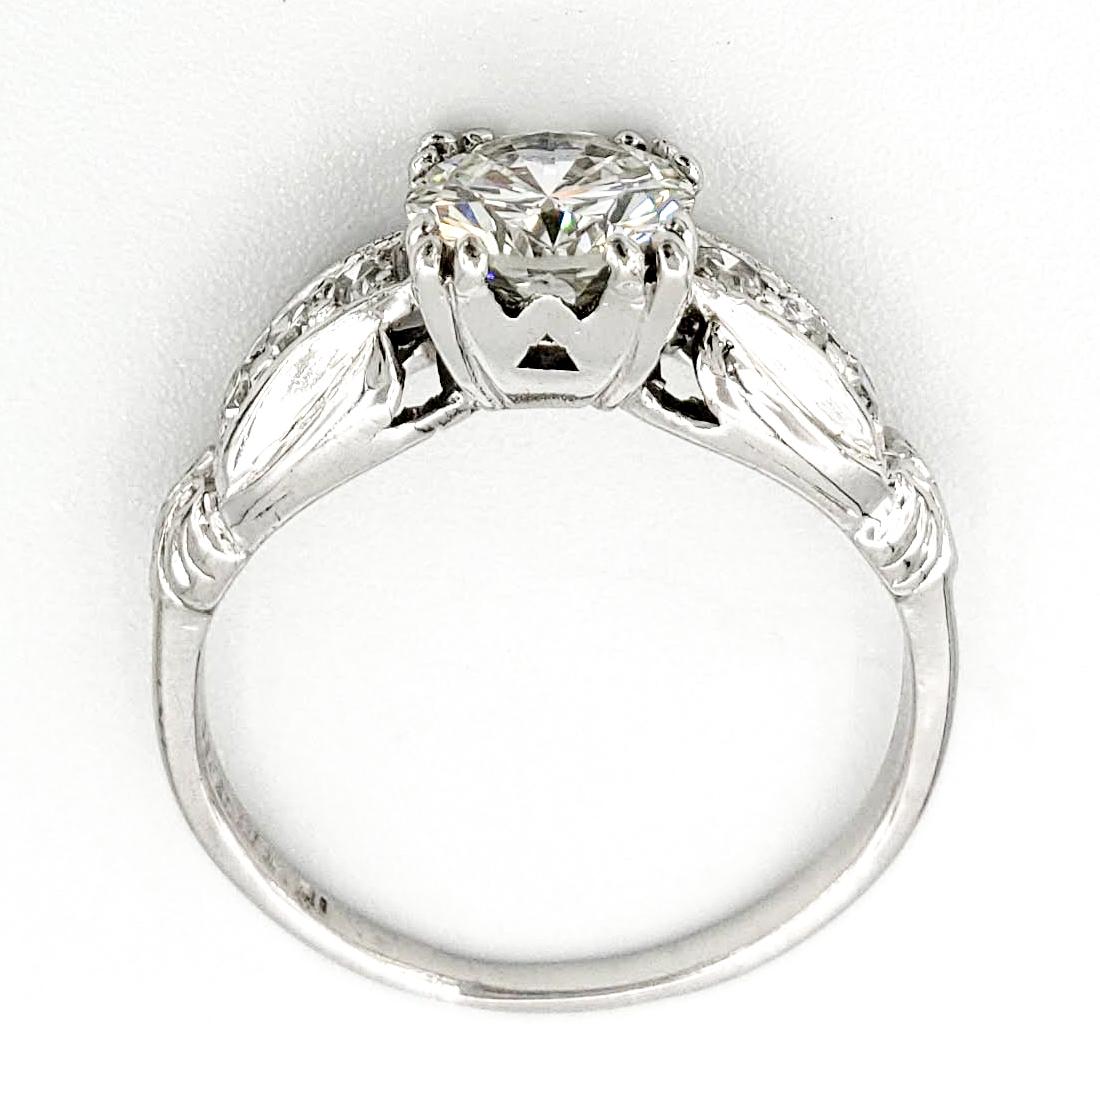 vintage-platinum-engagement-ring-with-0-82-round-brilliant-cut-diamond-egl-g-vs2